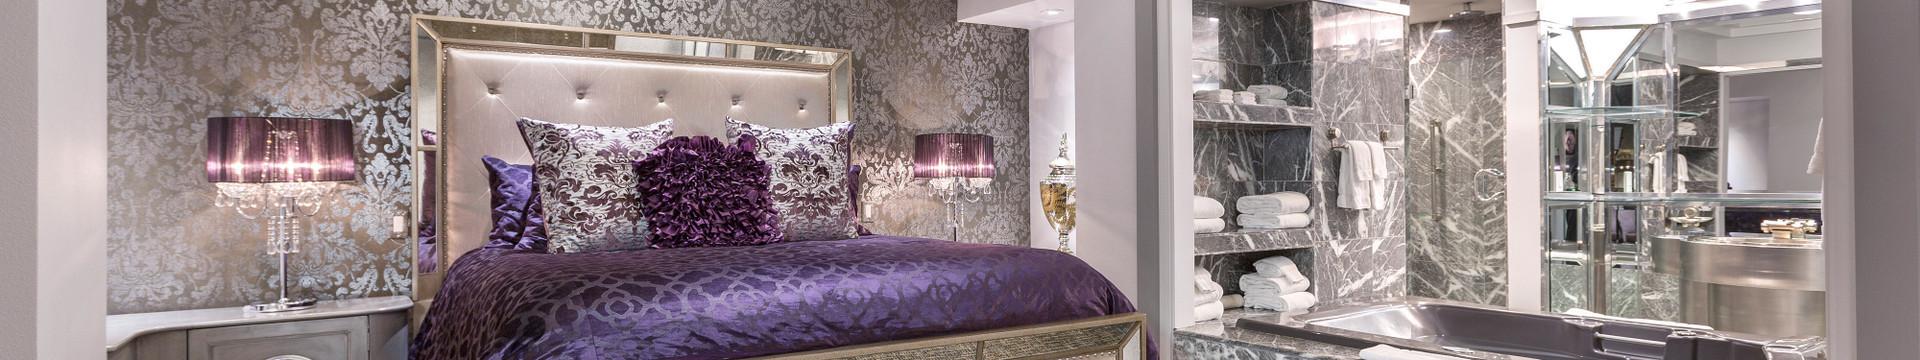 Luxury Suites Las Vegas   Westgate Las Vegas Resort & Casino   Westgate Resorts